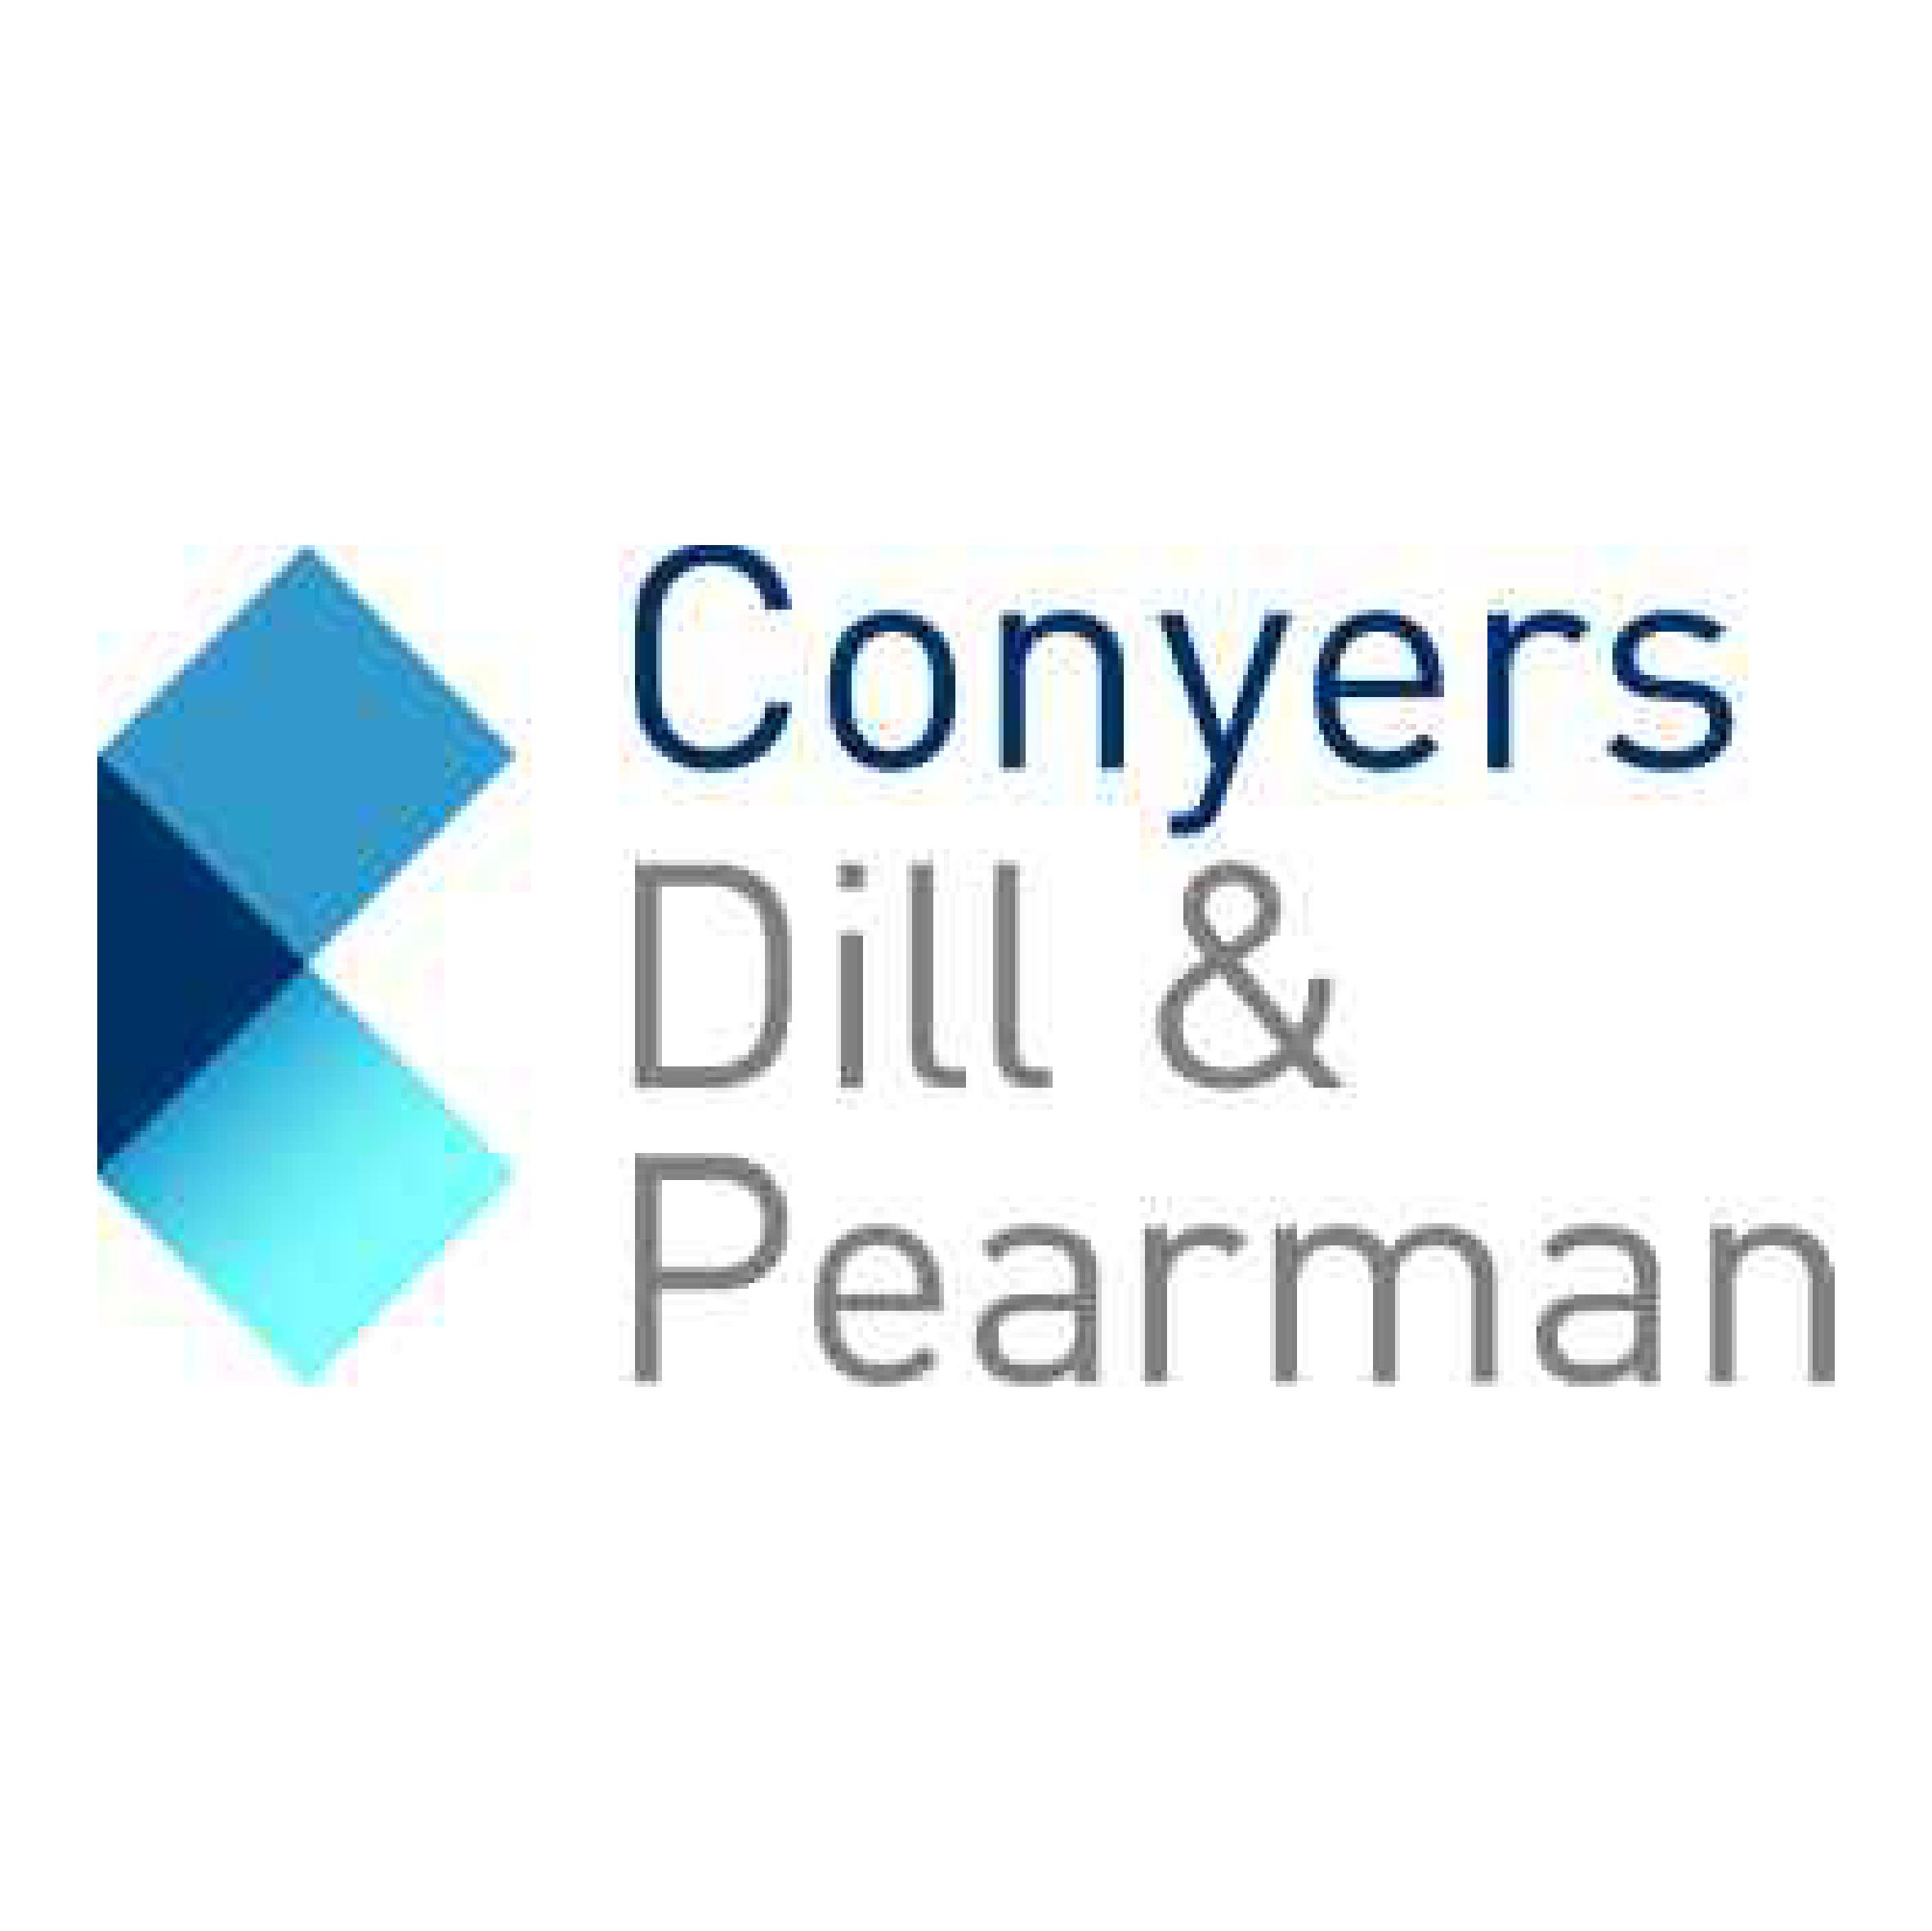 Conyers Dill & Pearman Logo.